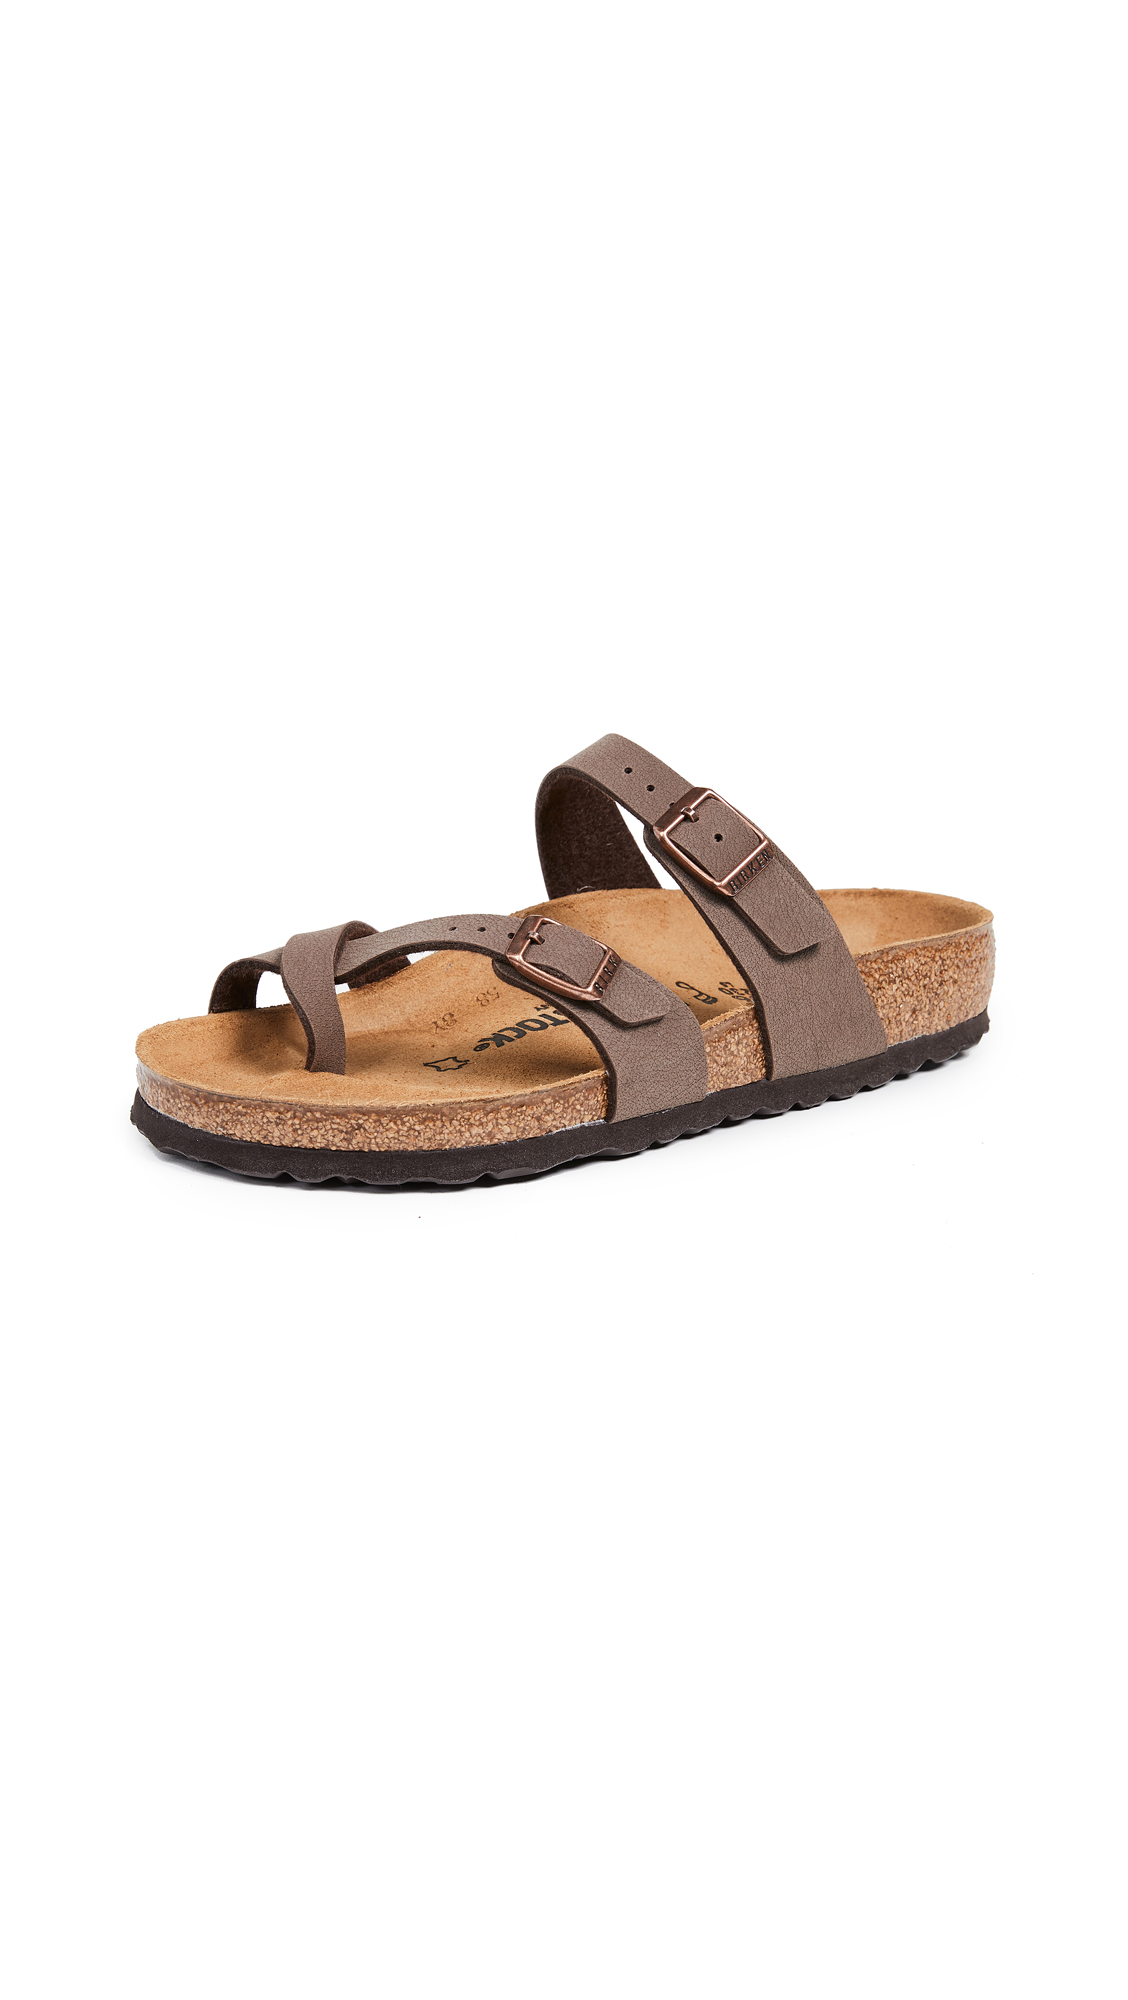 Birkenstock Mayari Sandals - Mocha